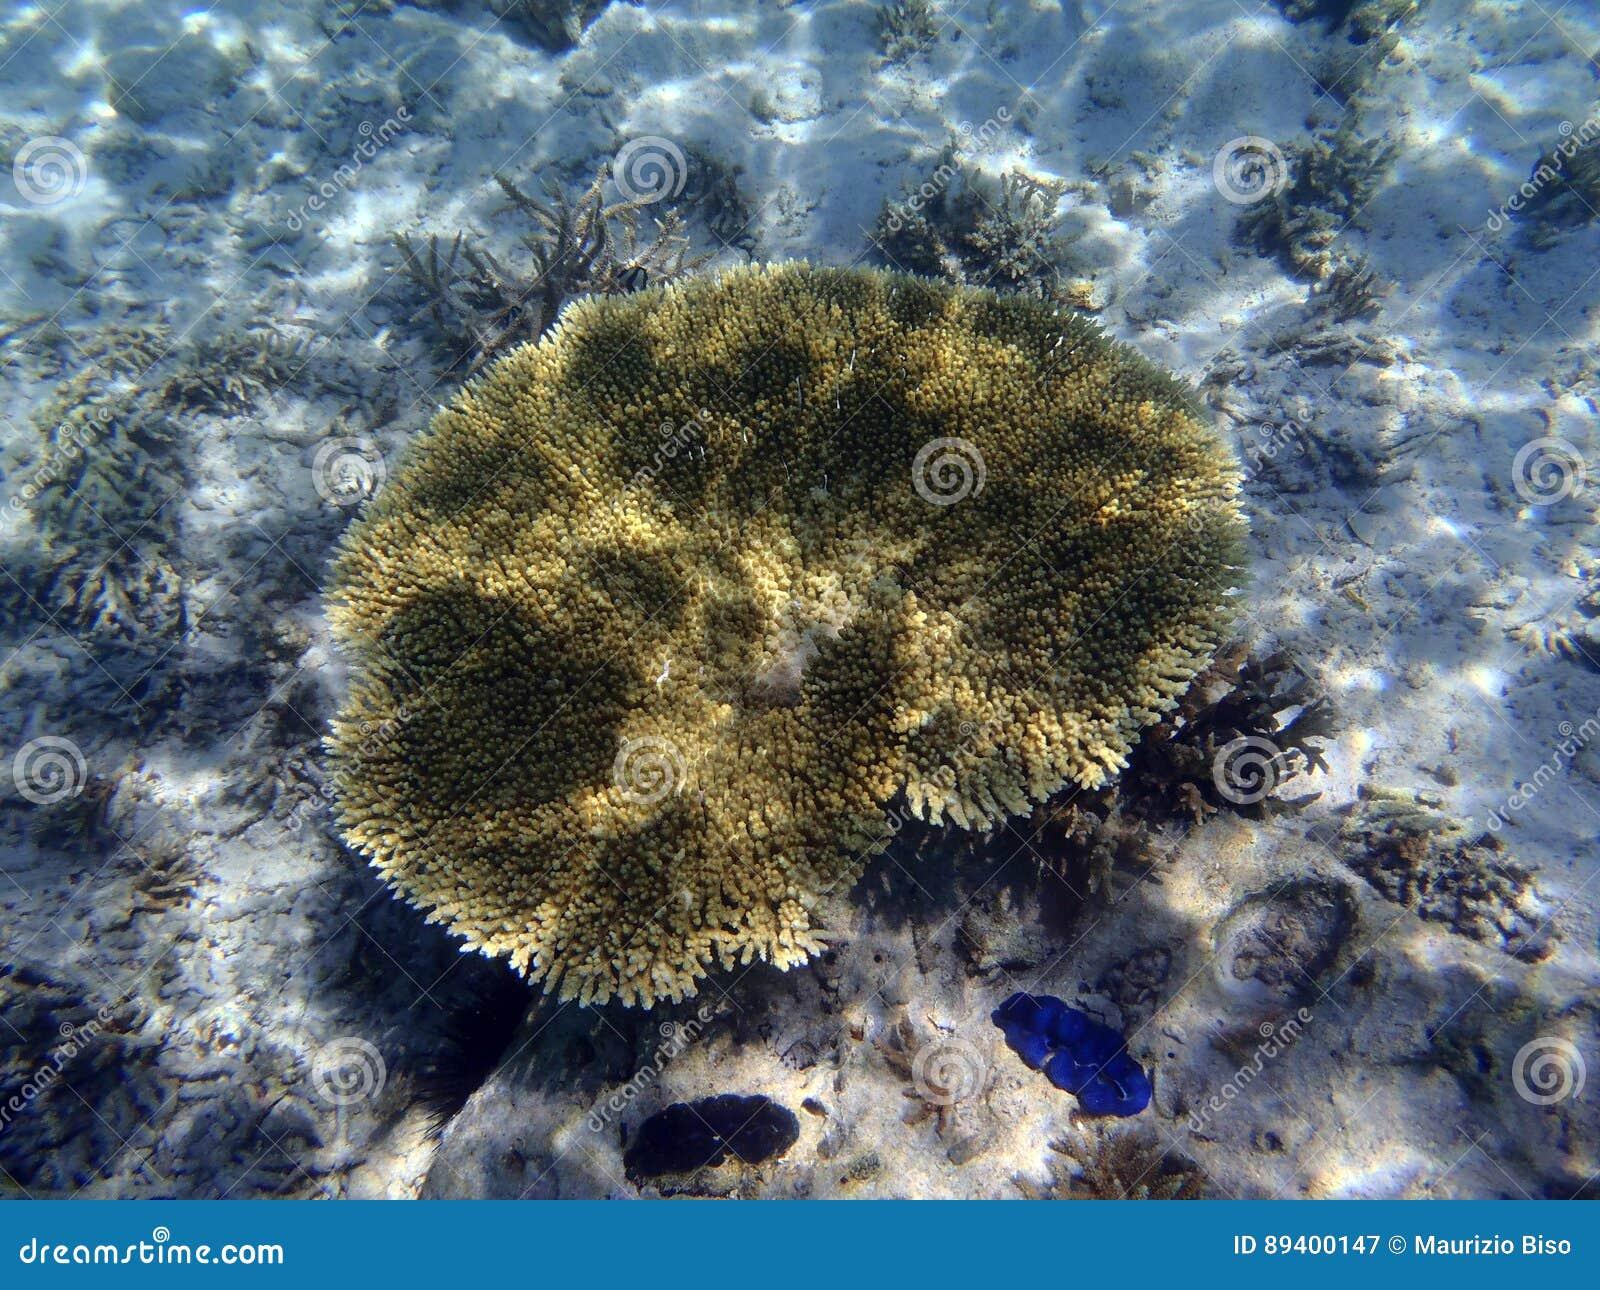 Recife de corais colorido bonito no Oceano Pacífico